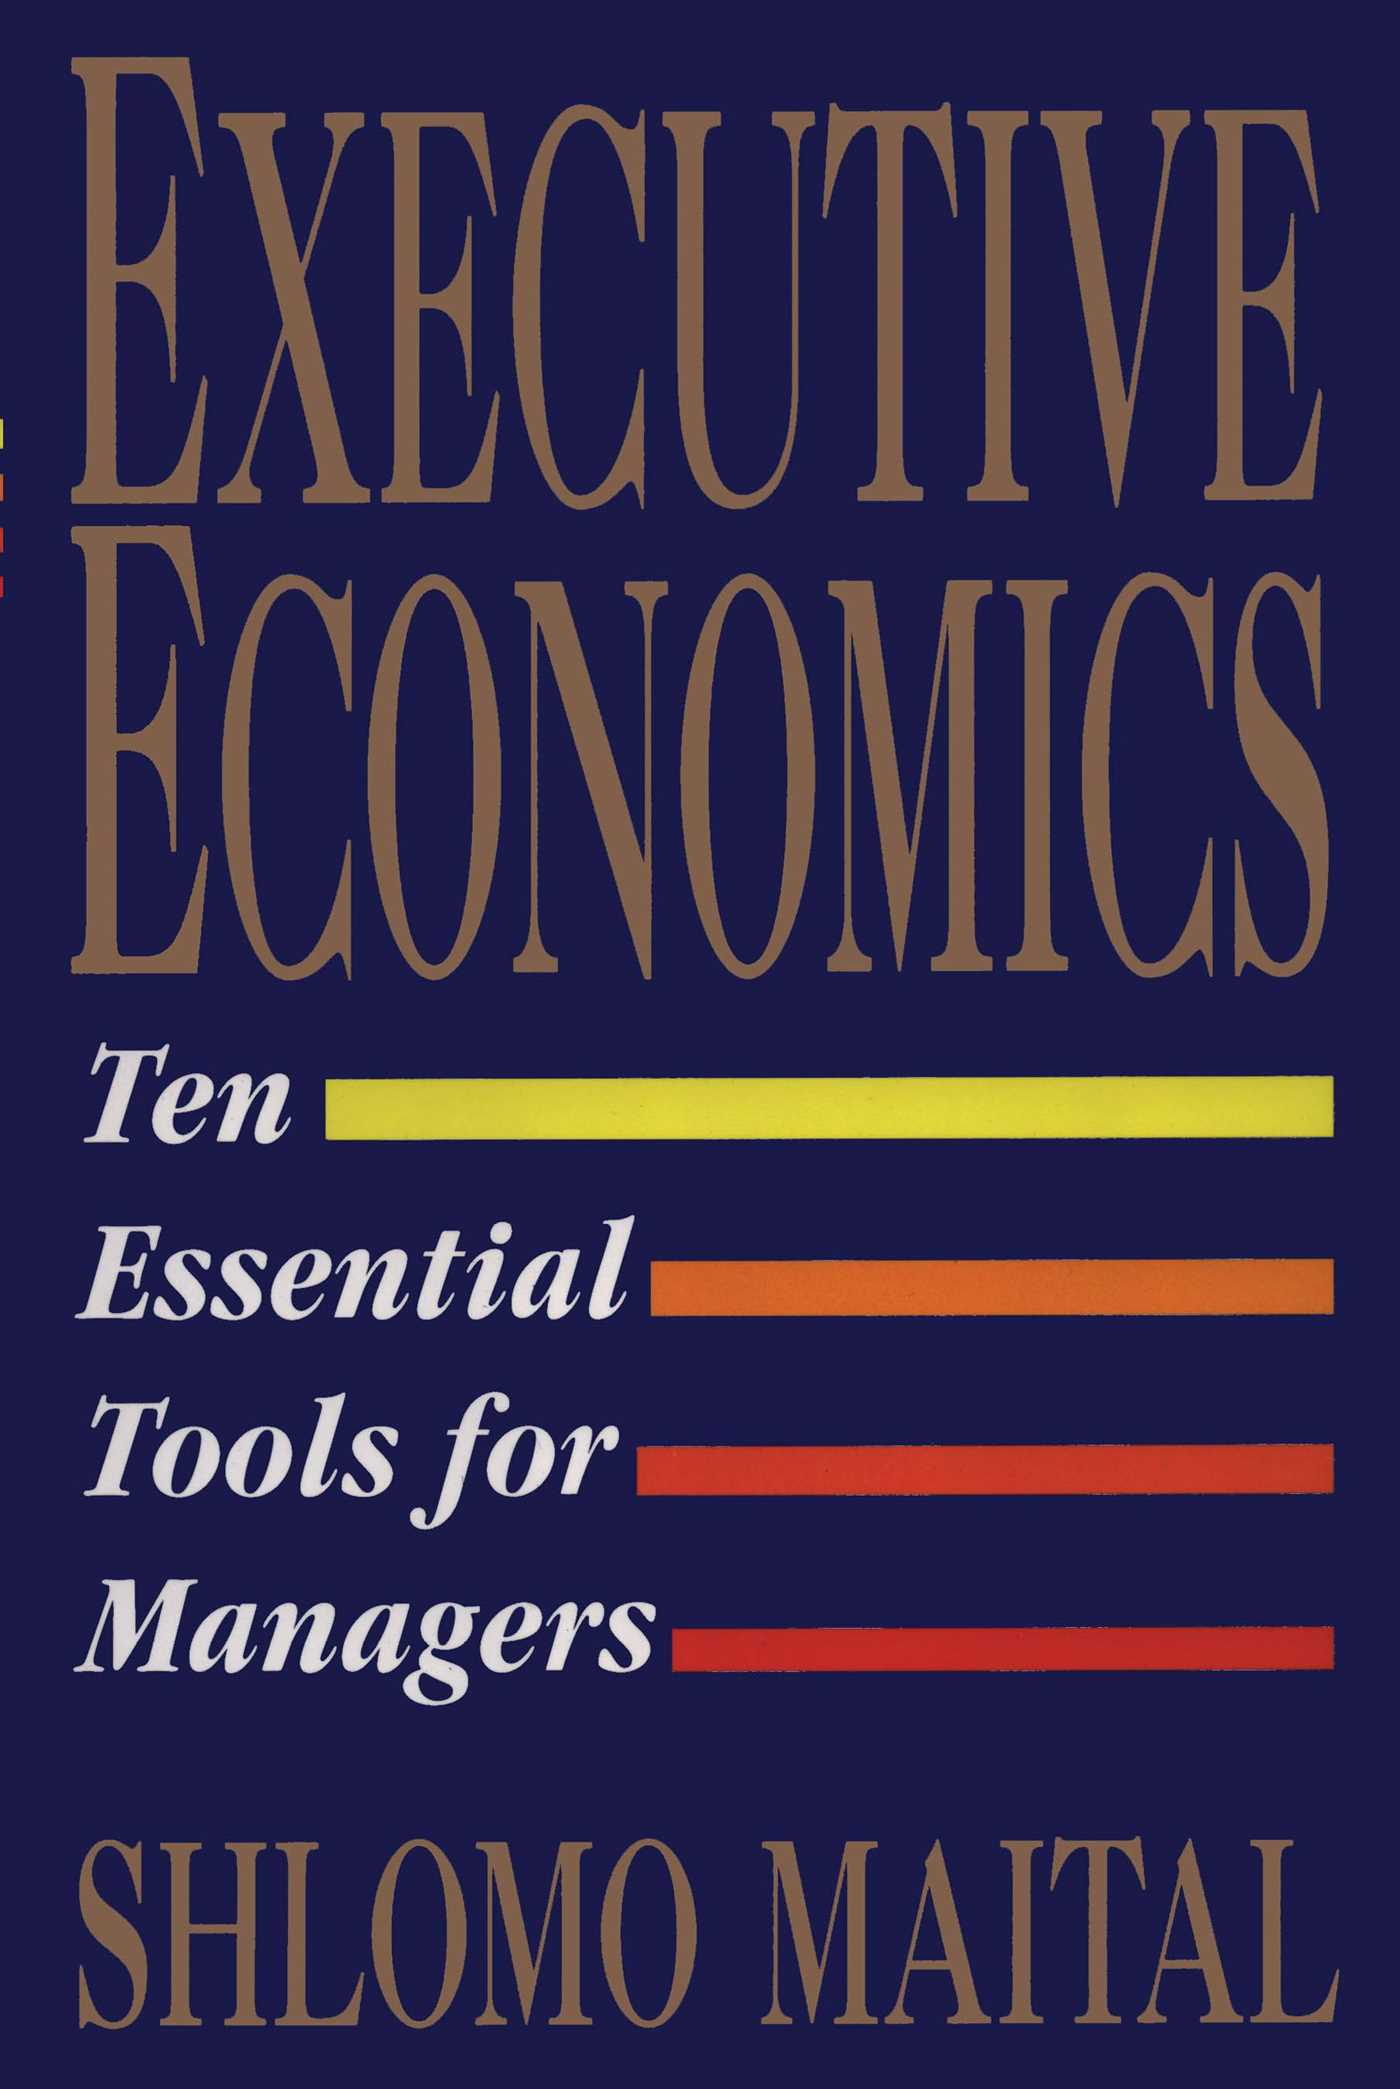 Executive economics 9781451631593 hr